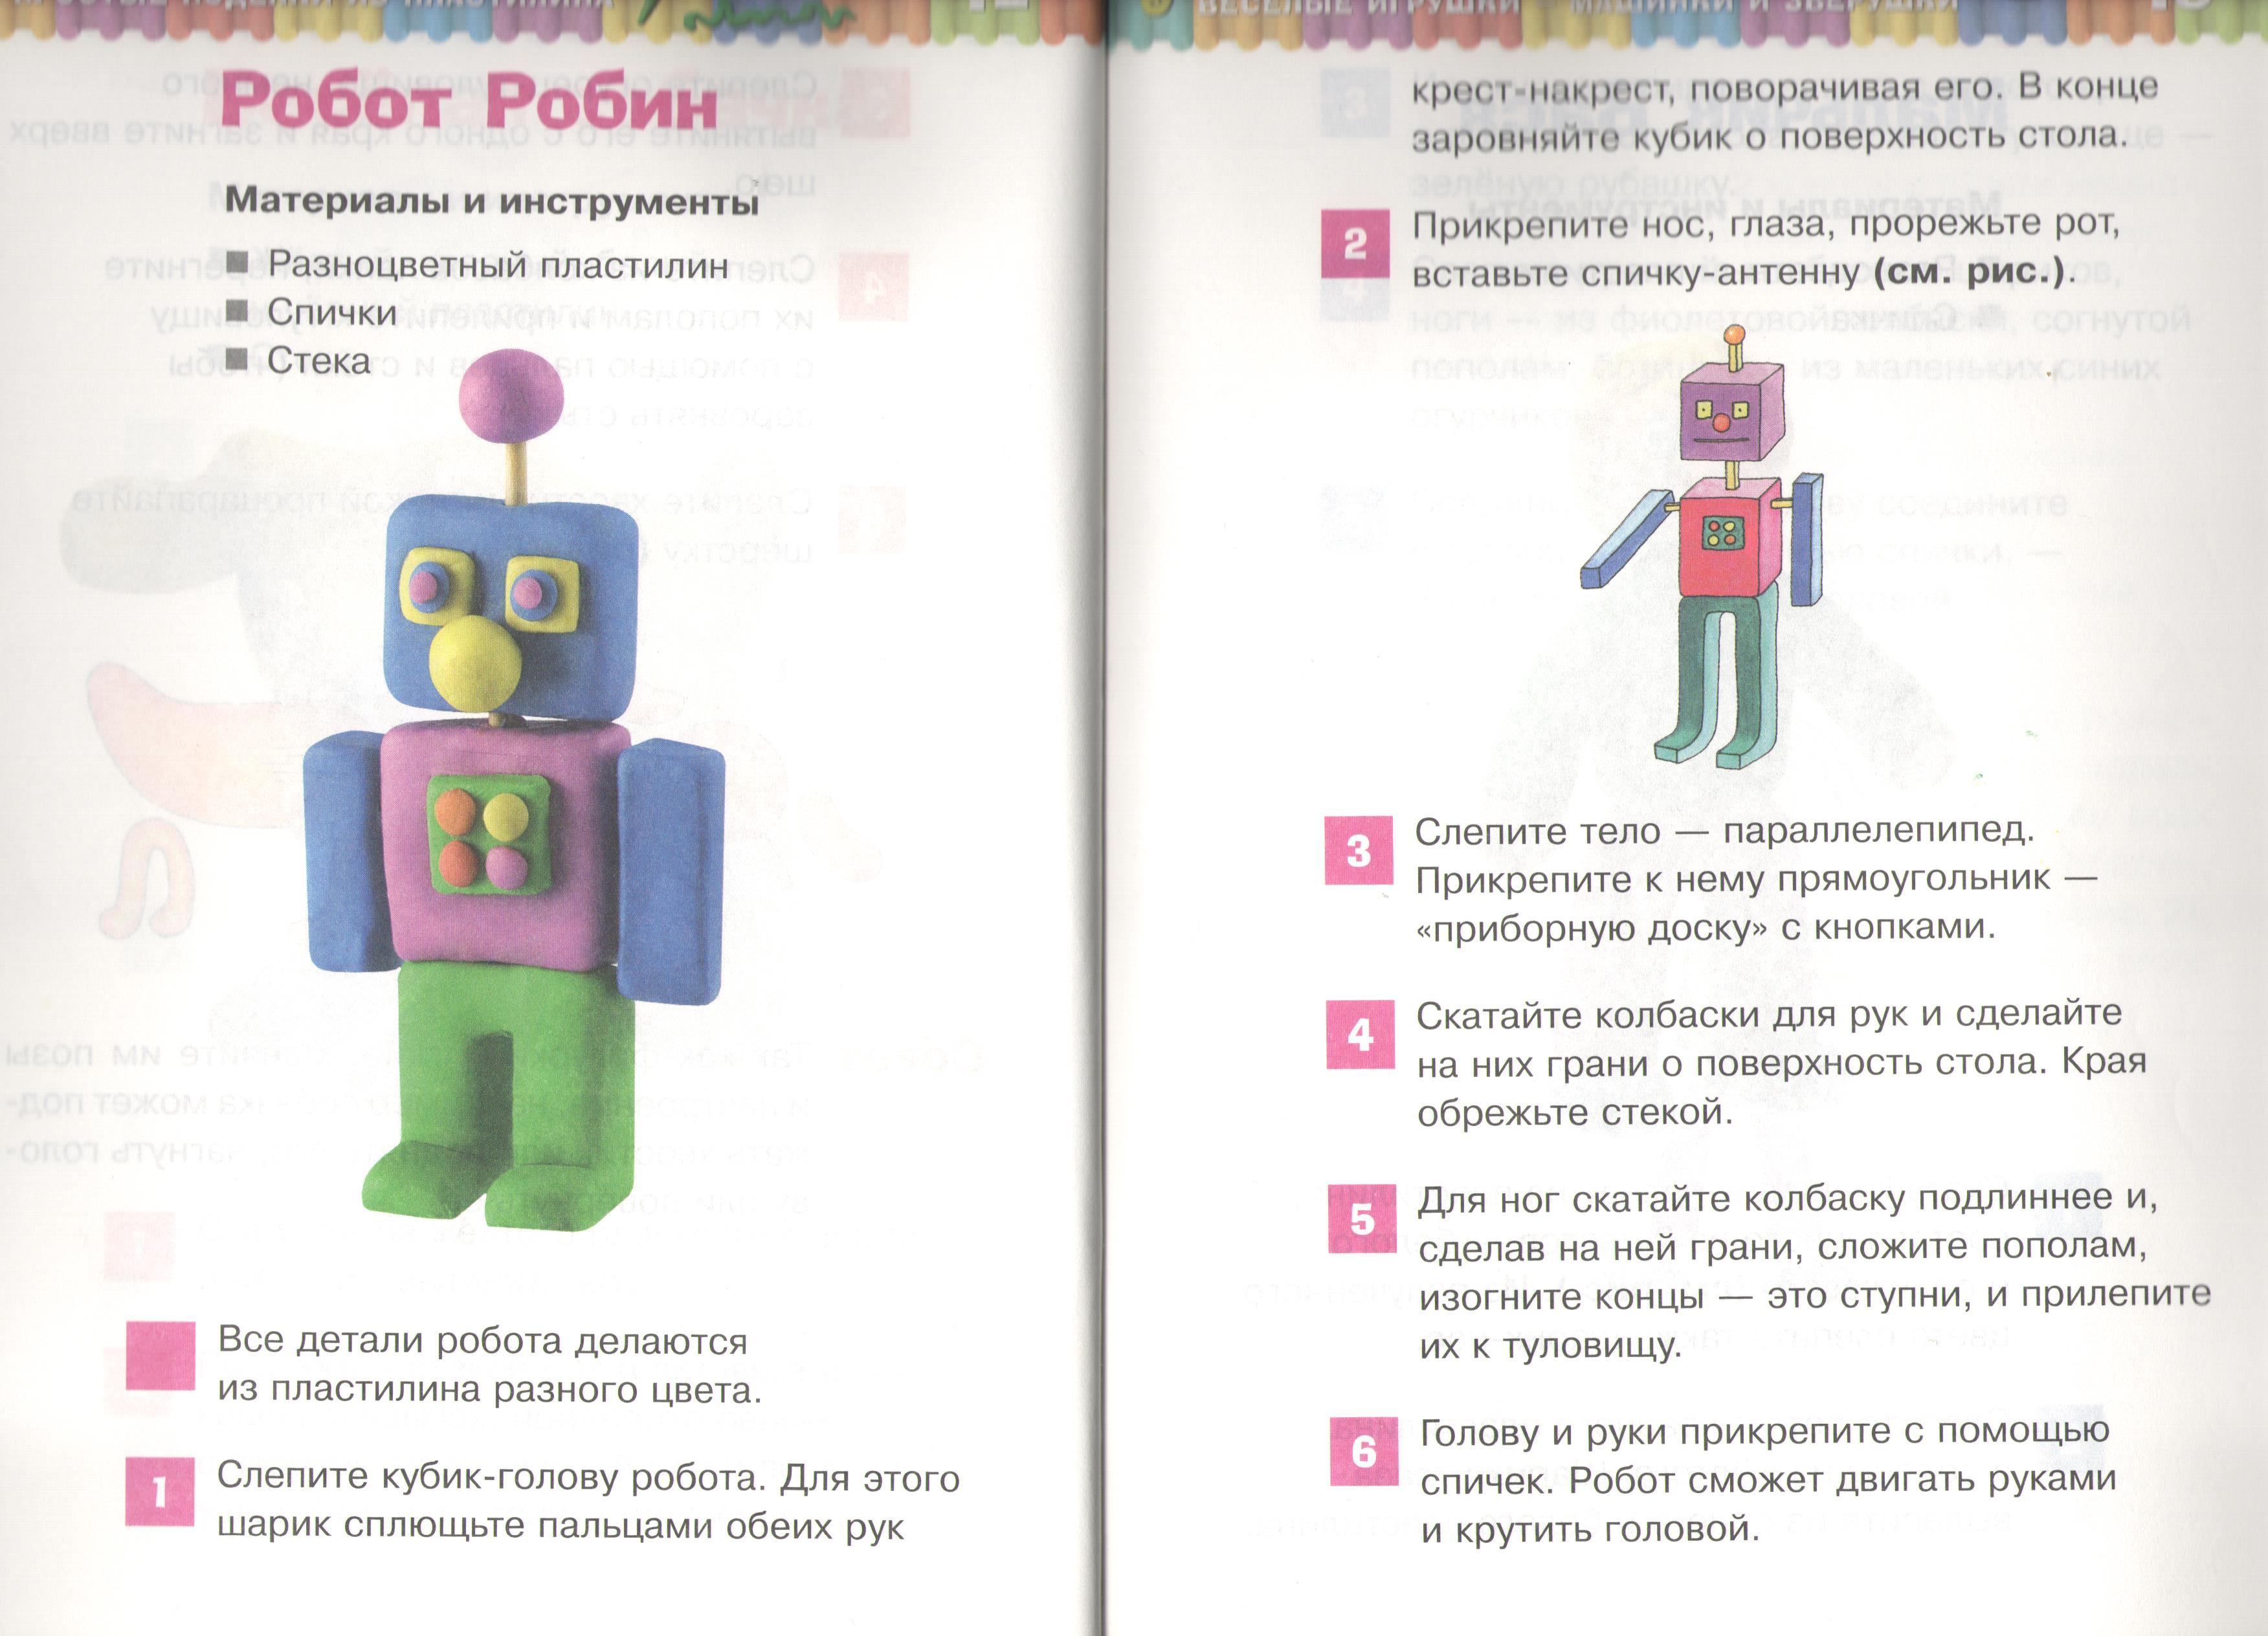 C:\Users\Admin\Desktop\Работа с пластилином\пластилин-Робот Робин 001.jpg